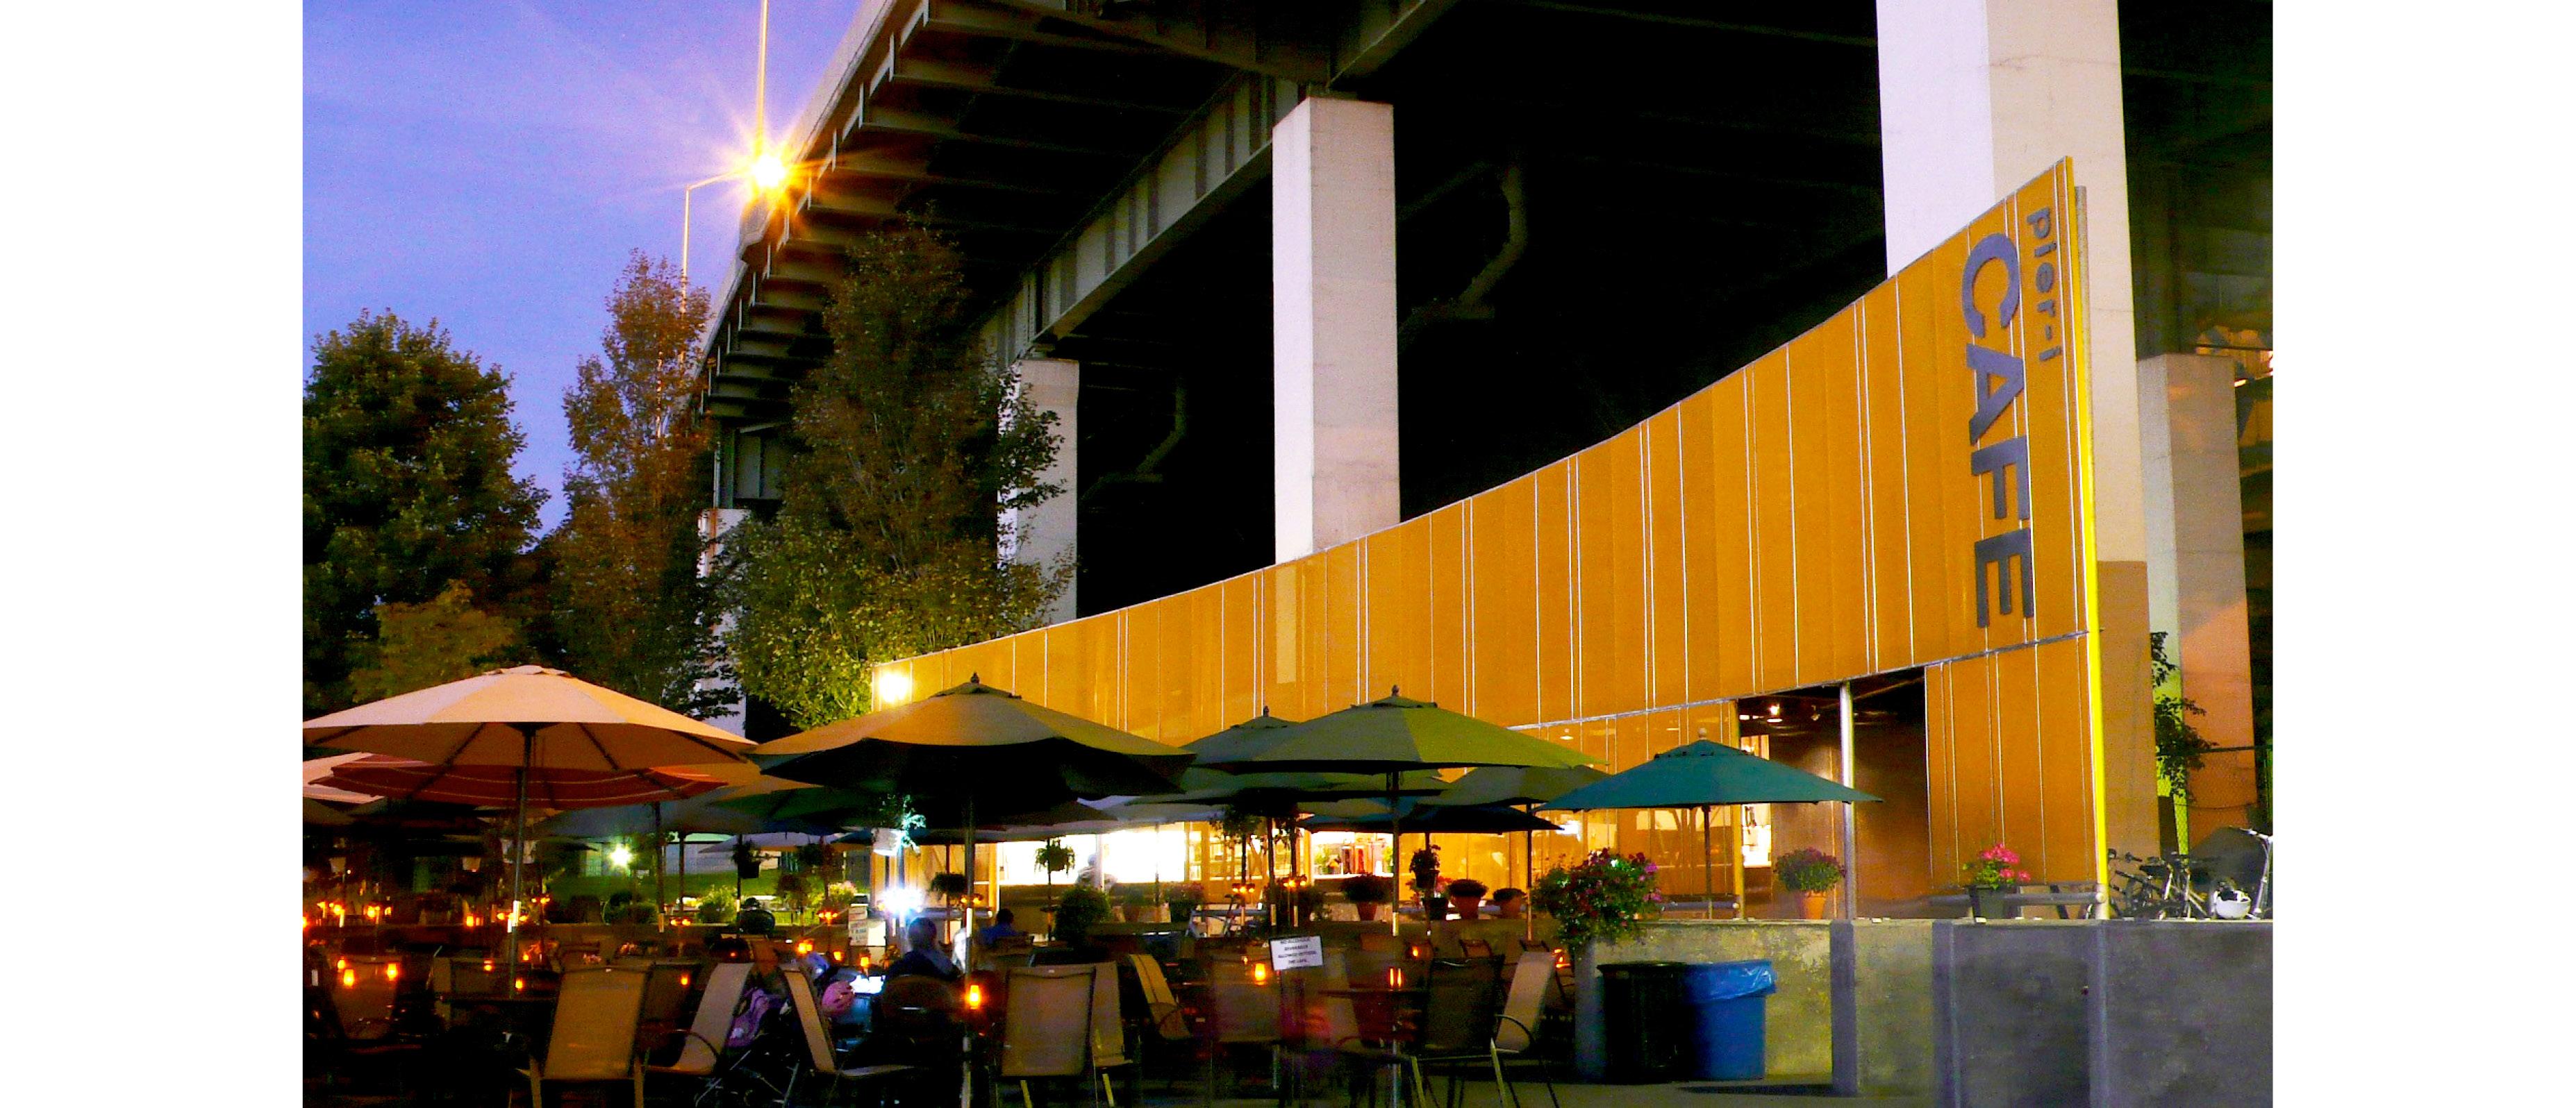 Pier i Cafe 1